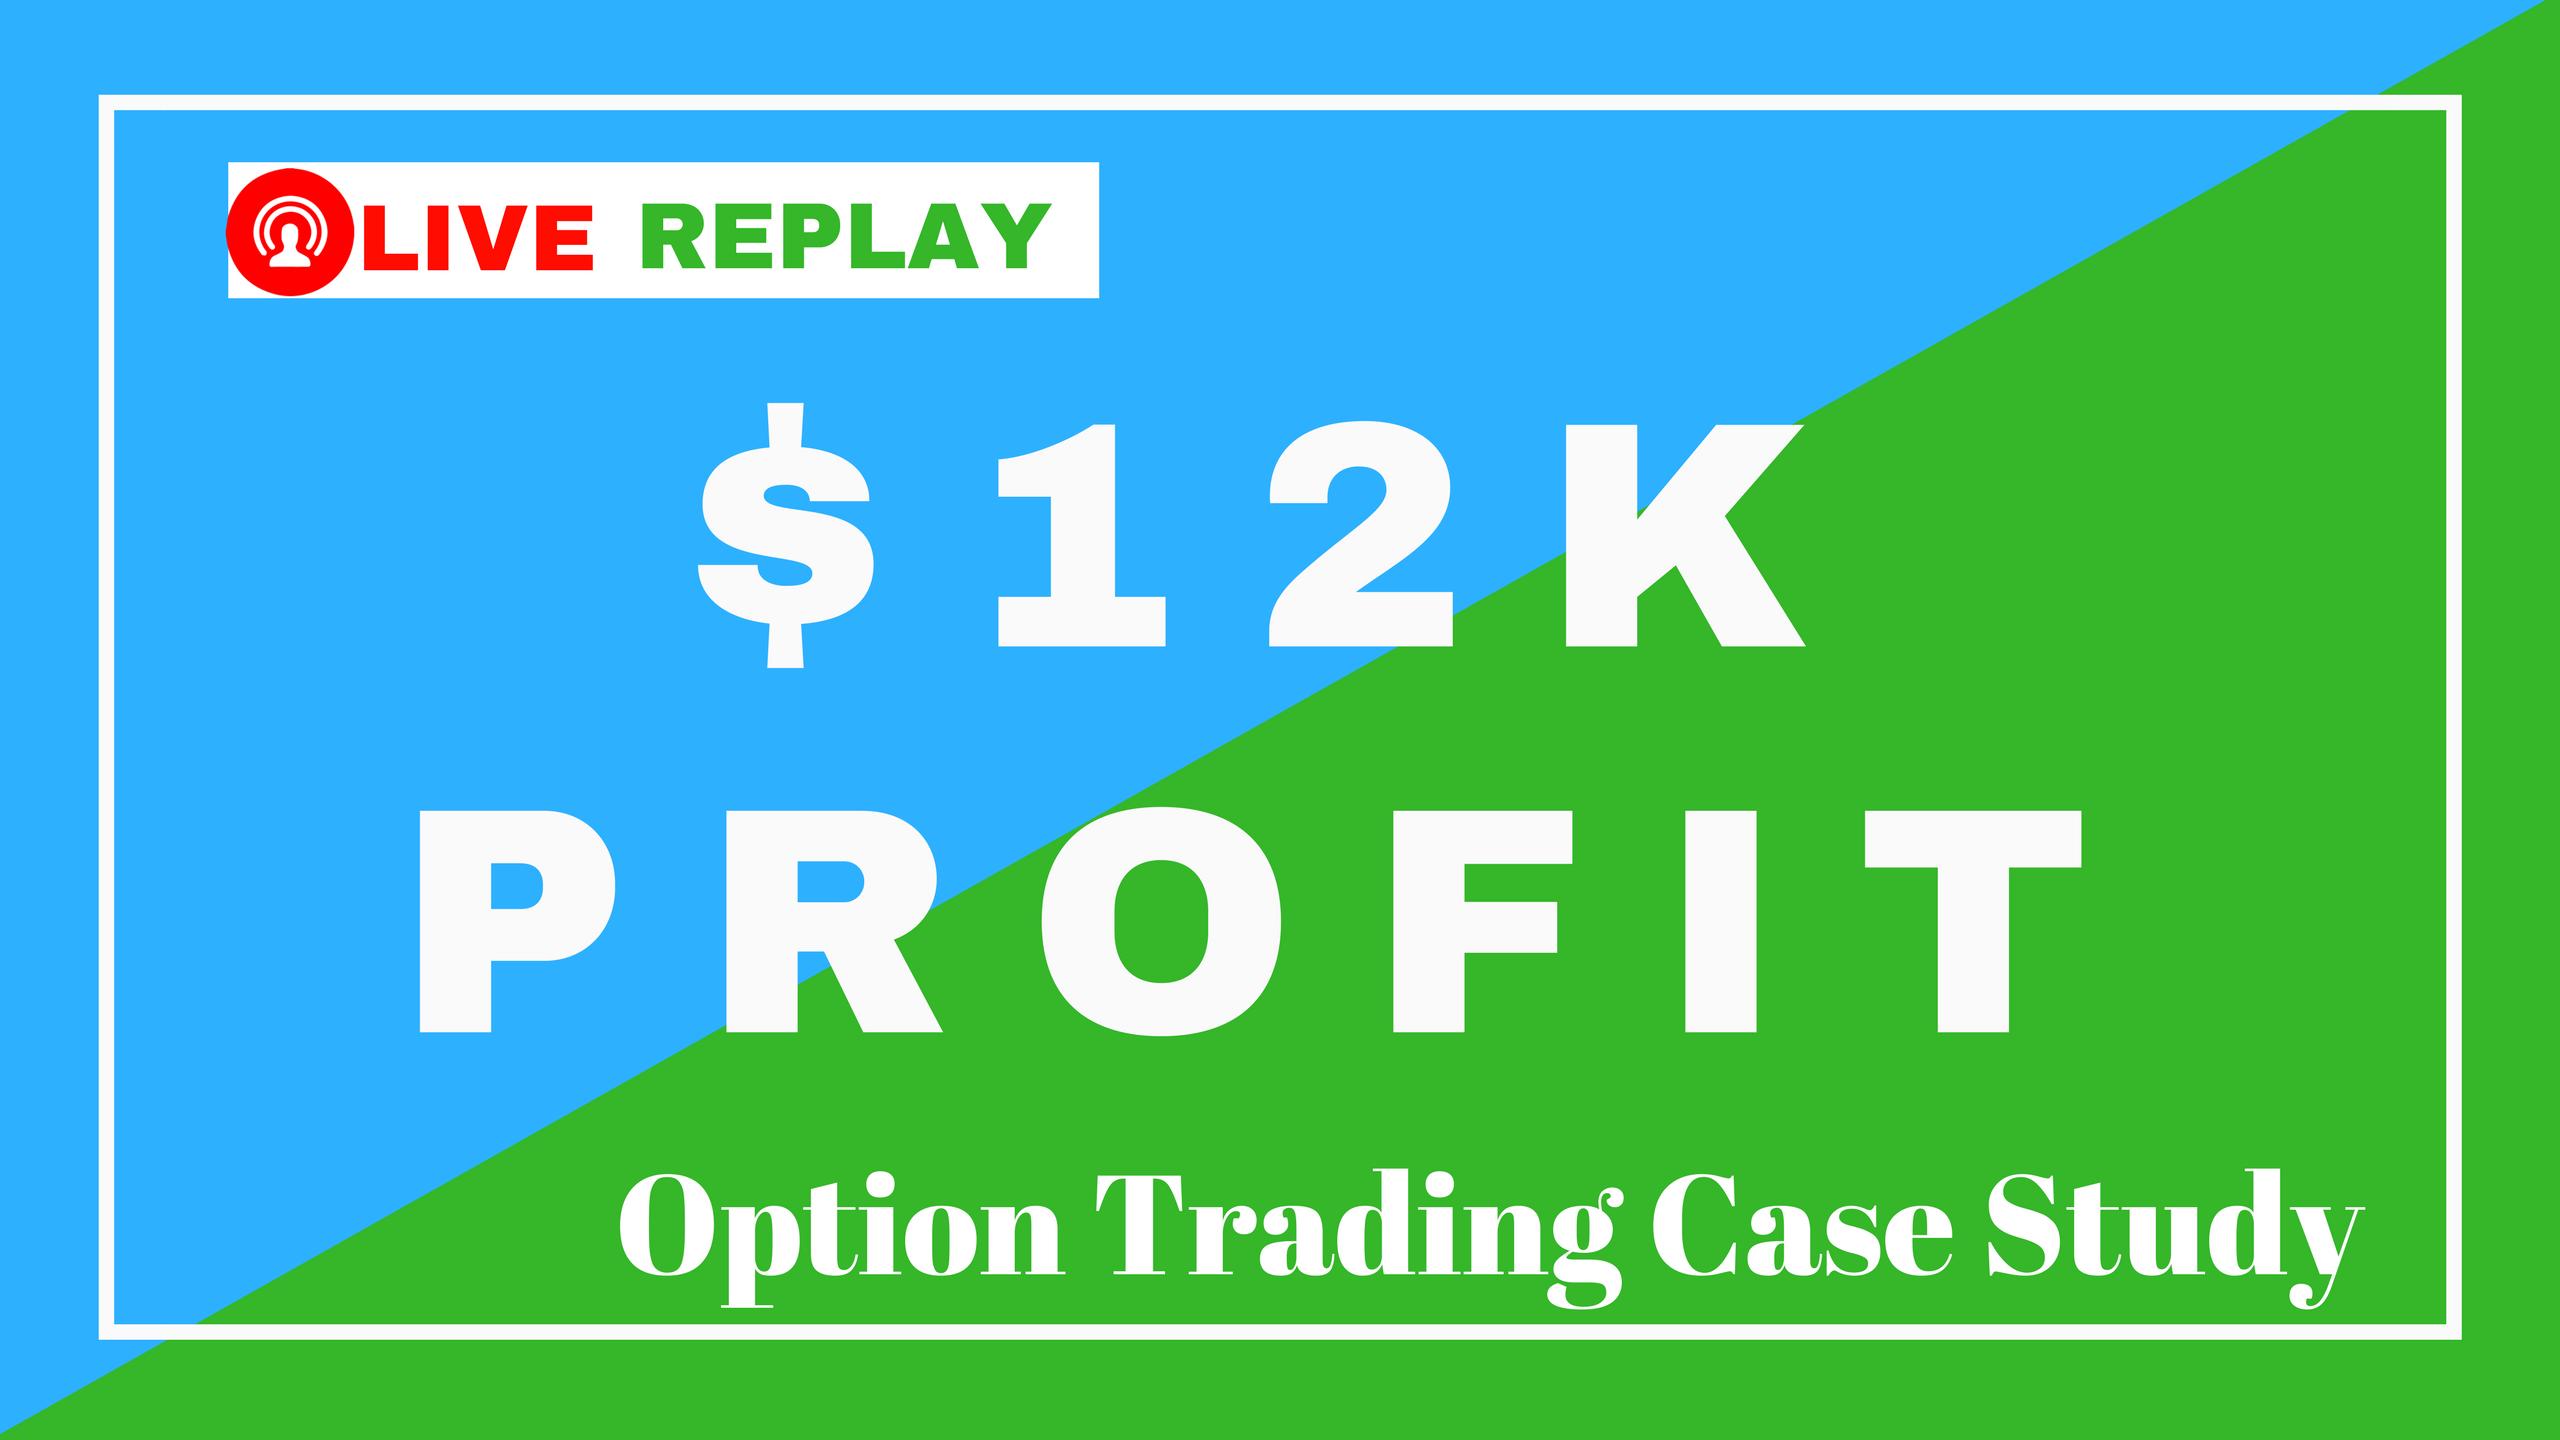 Option Trade Case Study: 19% Return in 7 Days on Visa